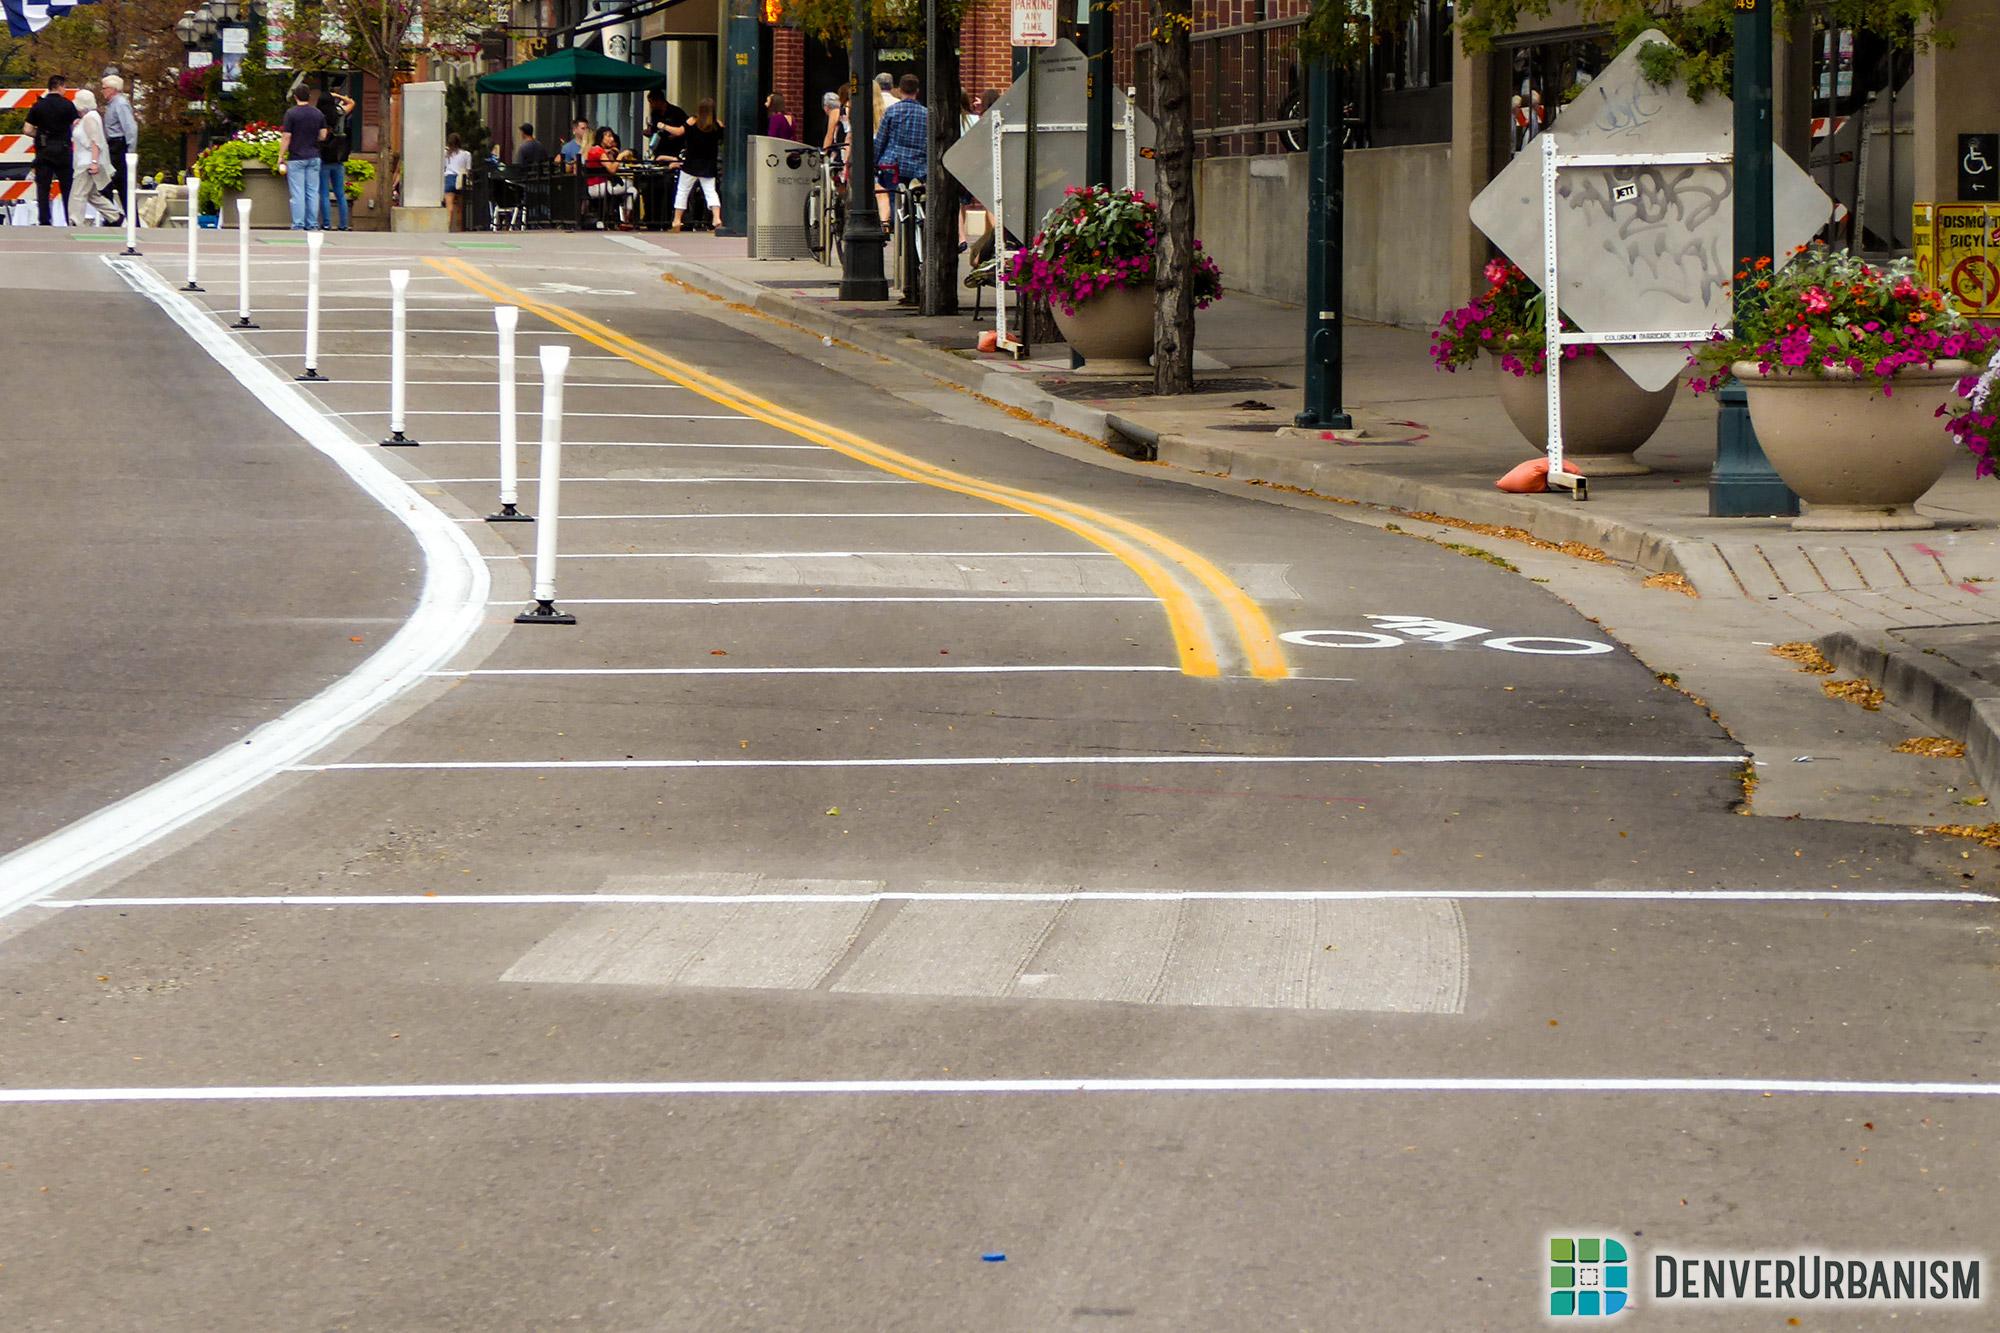 New bike lane on Larimer Street from Creekfront Plaza to 14th Street